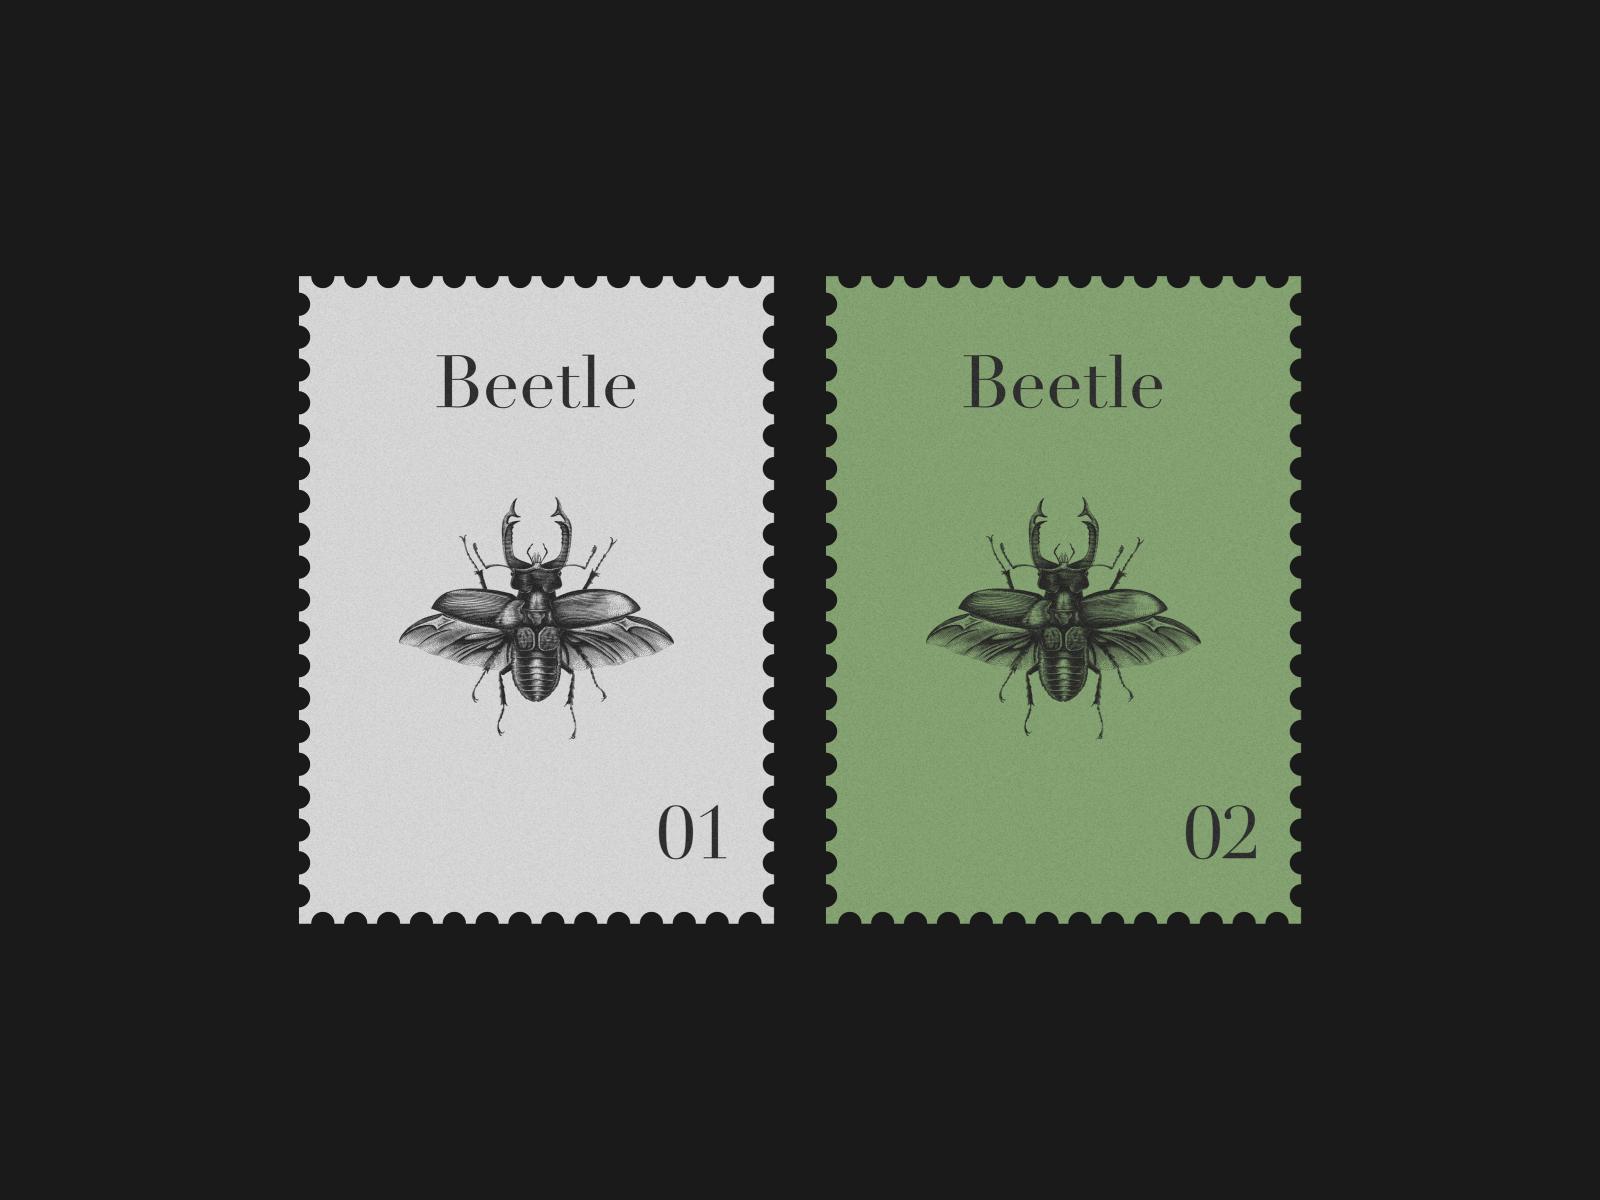 Beetle Postage Stamp By Ika Margania On Dribbble